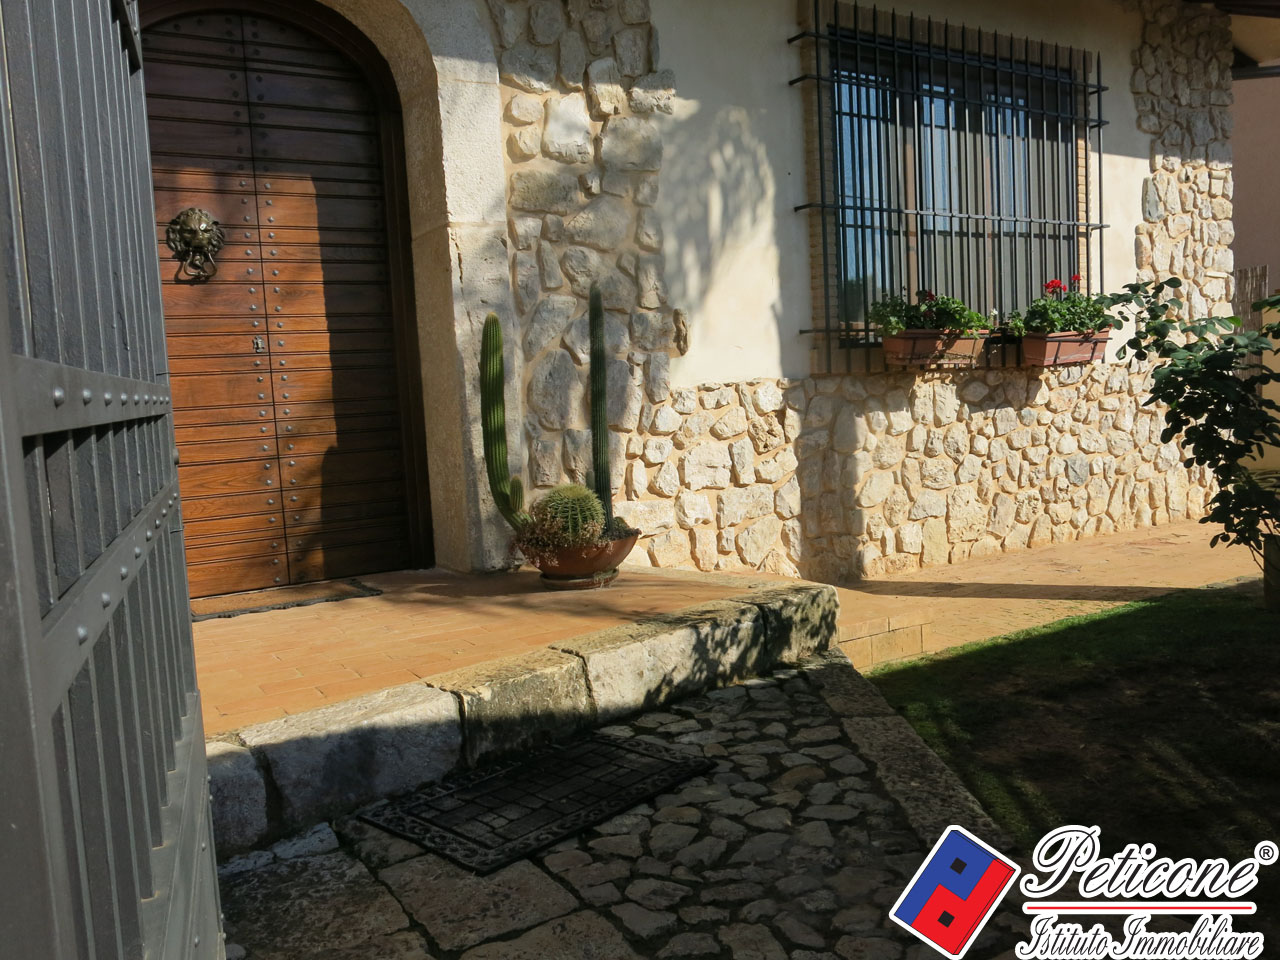 Villa in Vendita a Fondi: 3 locali, 107 mq - Foto 19